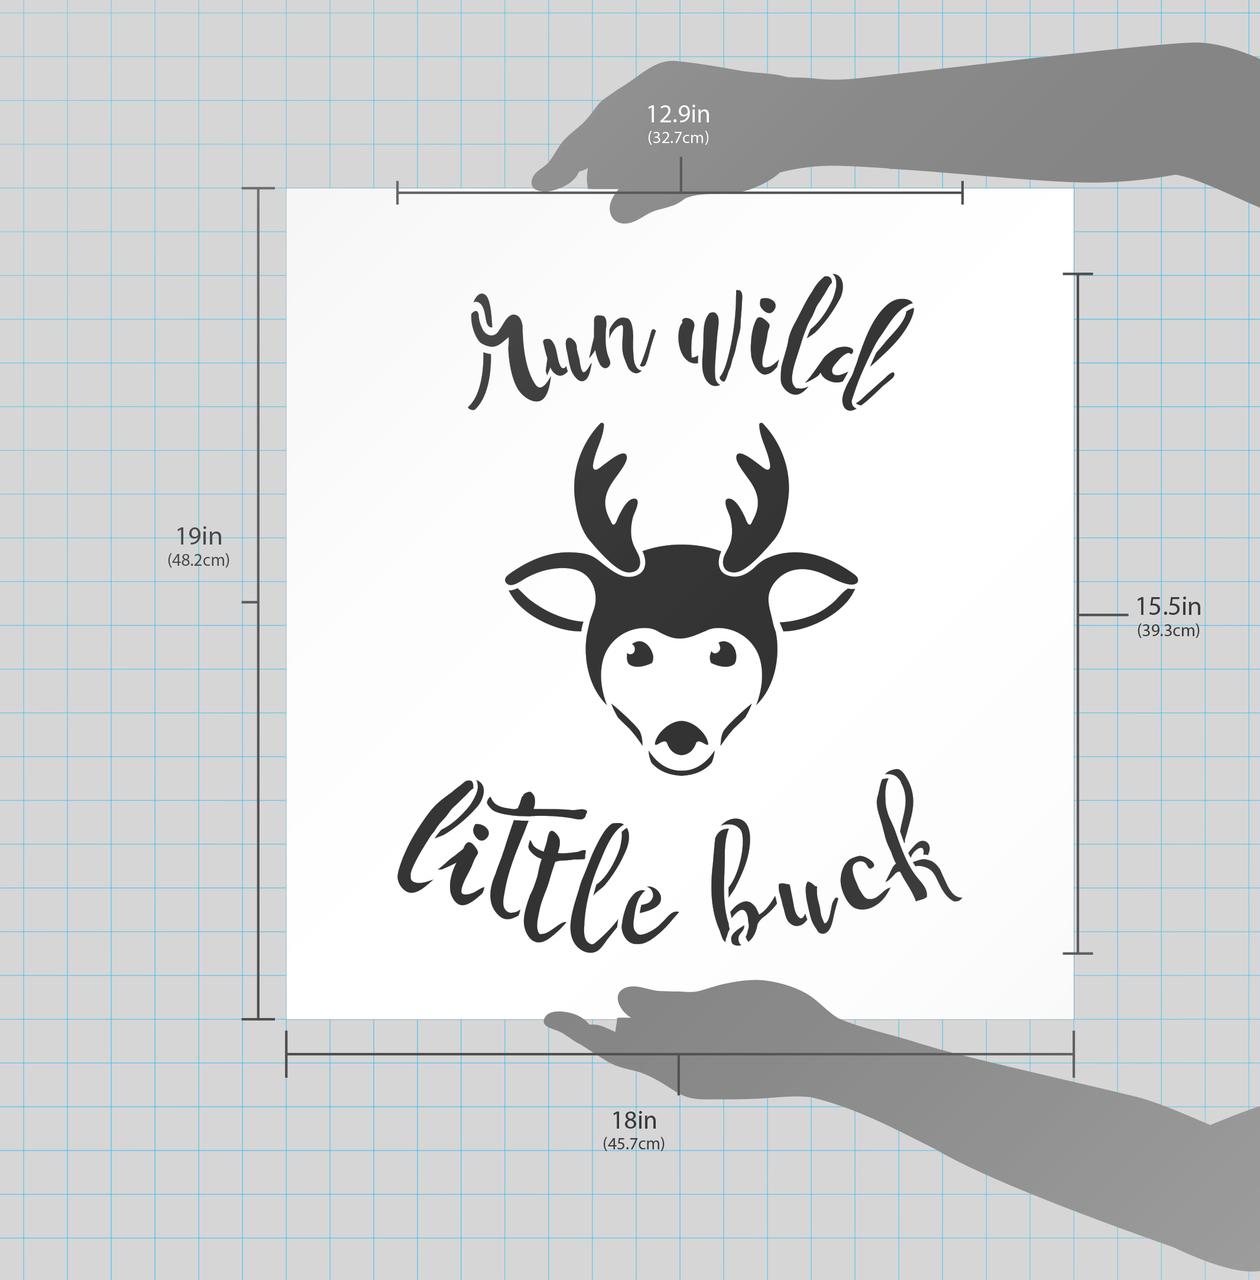 "Run Wild Little Buck - Curved Hand Script - Word Art Stencil - 18"" x 19"" - STCL1769_5 - by StudioR12"